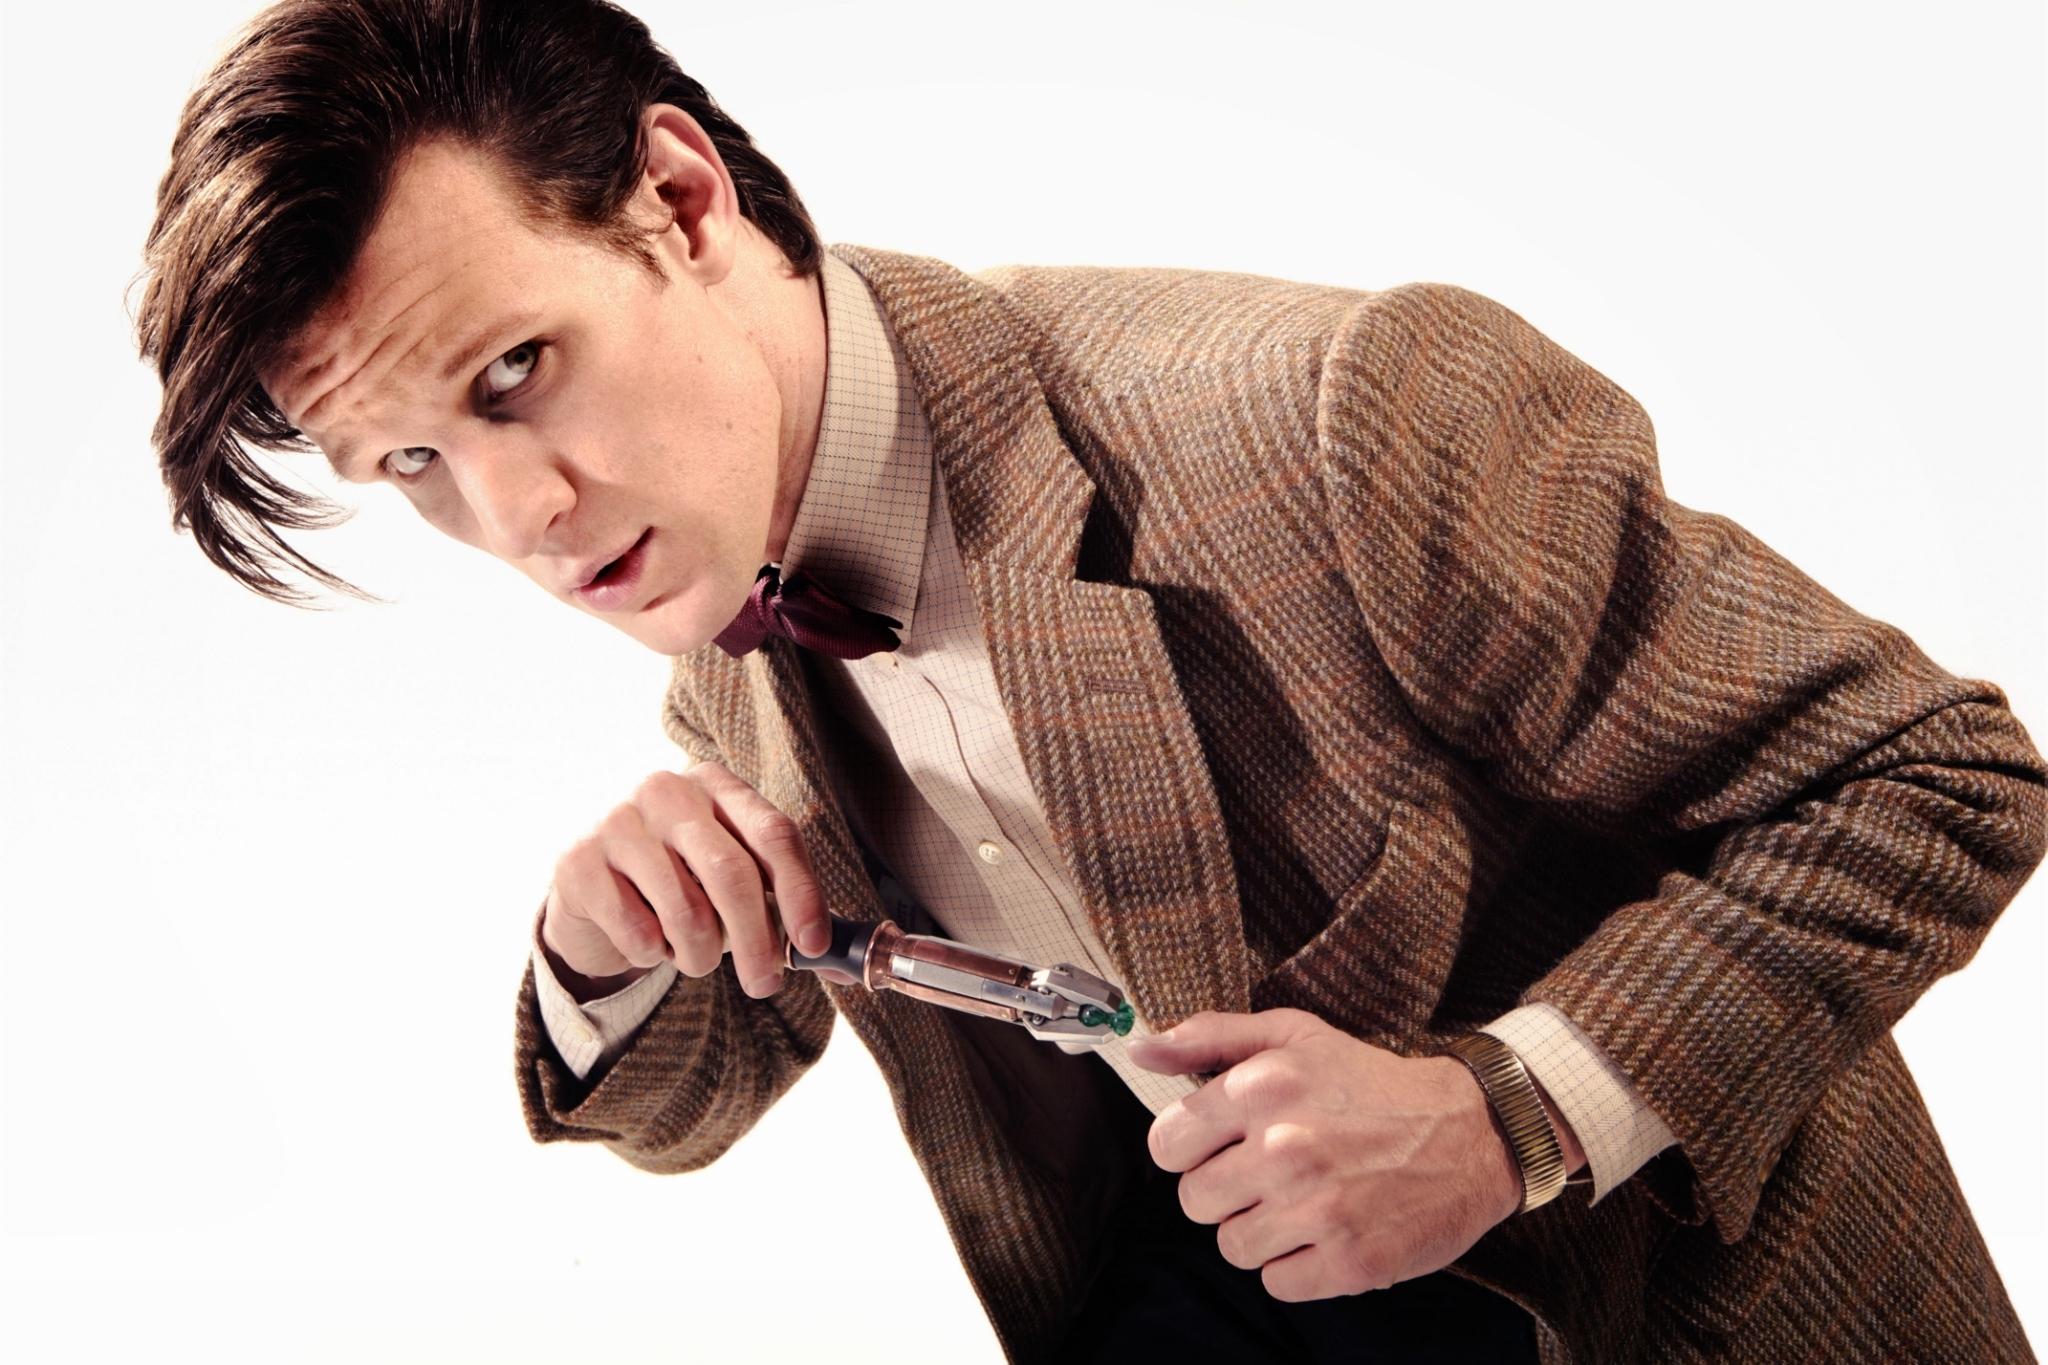 Doctor who doctor who matt smith matt smith male white background 2048x1365